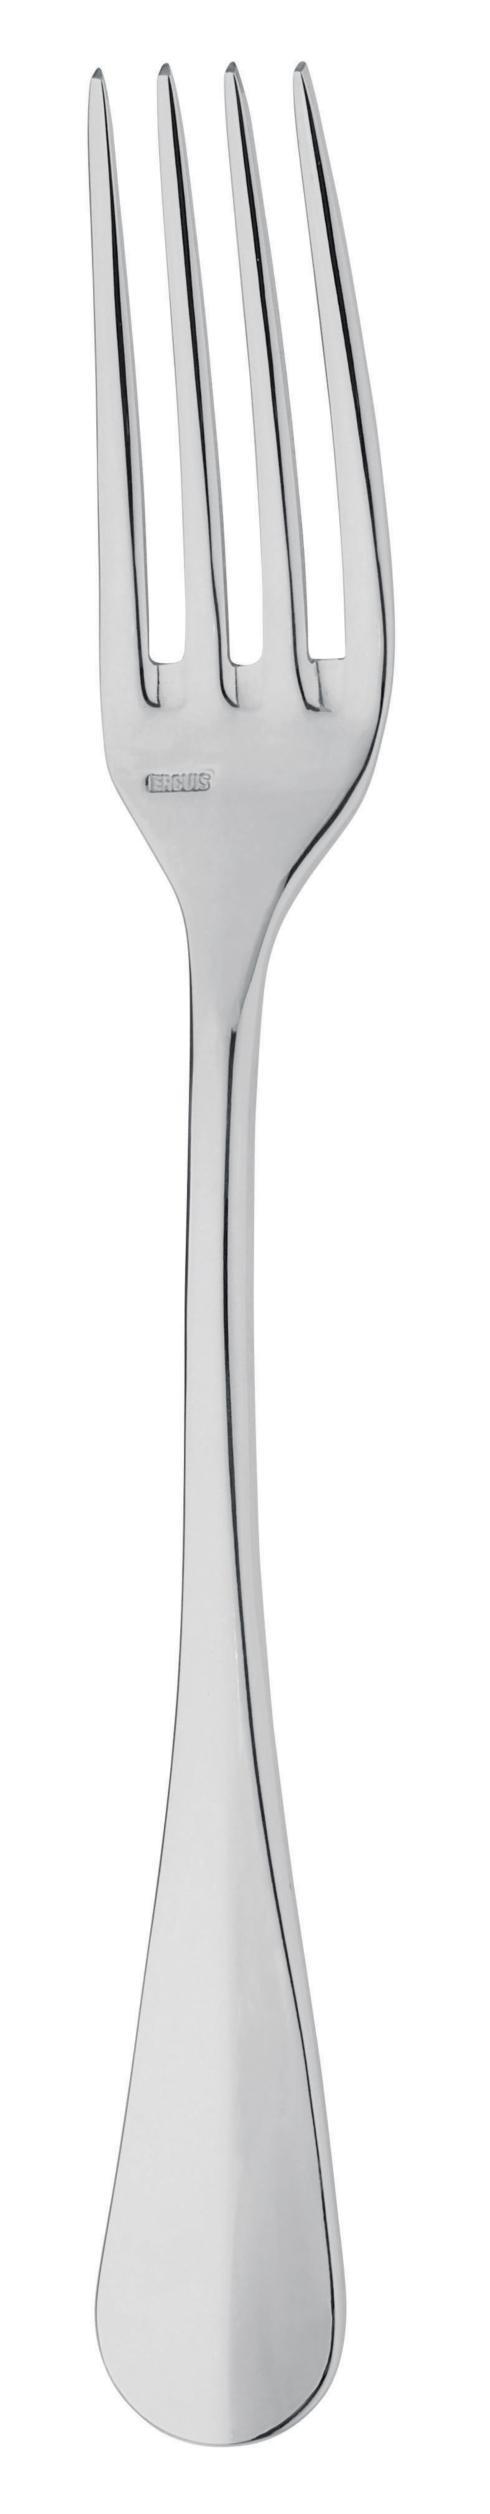 $60.00 Dinner Fork Silver - Plated